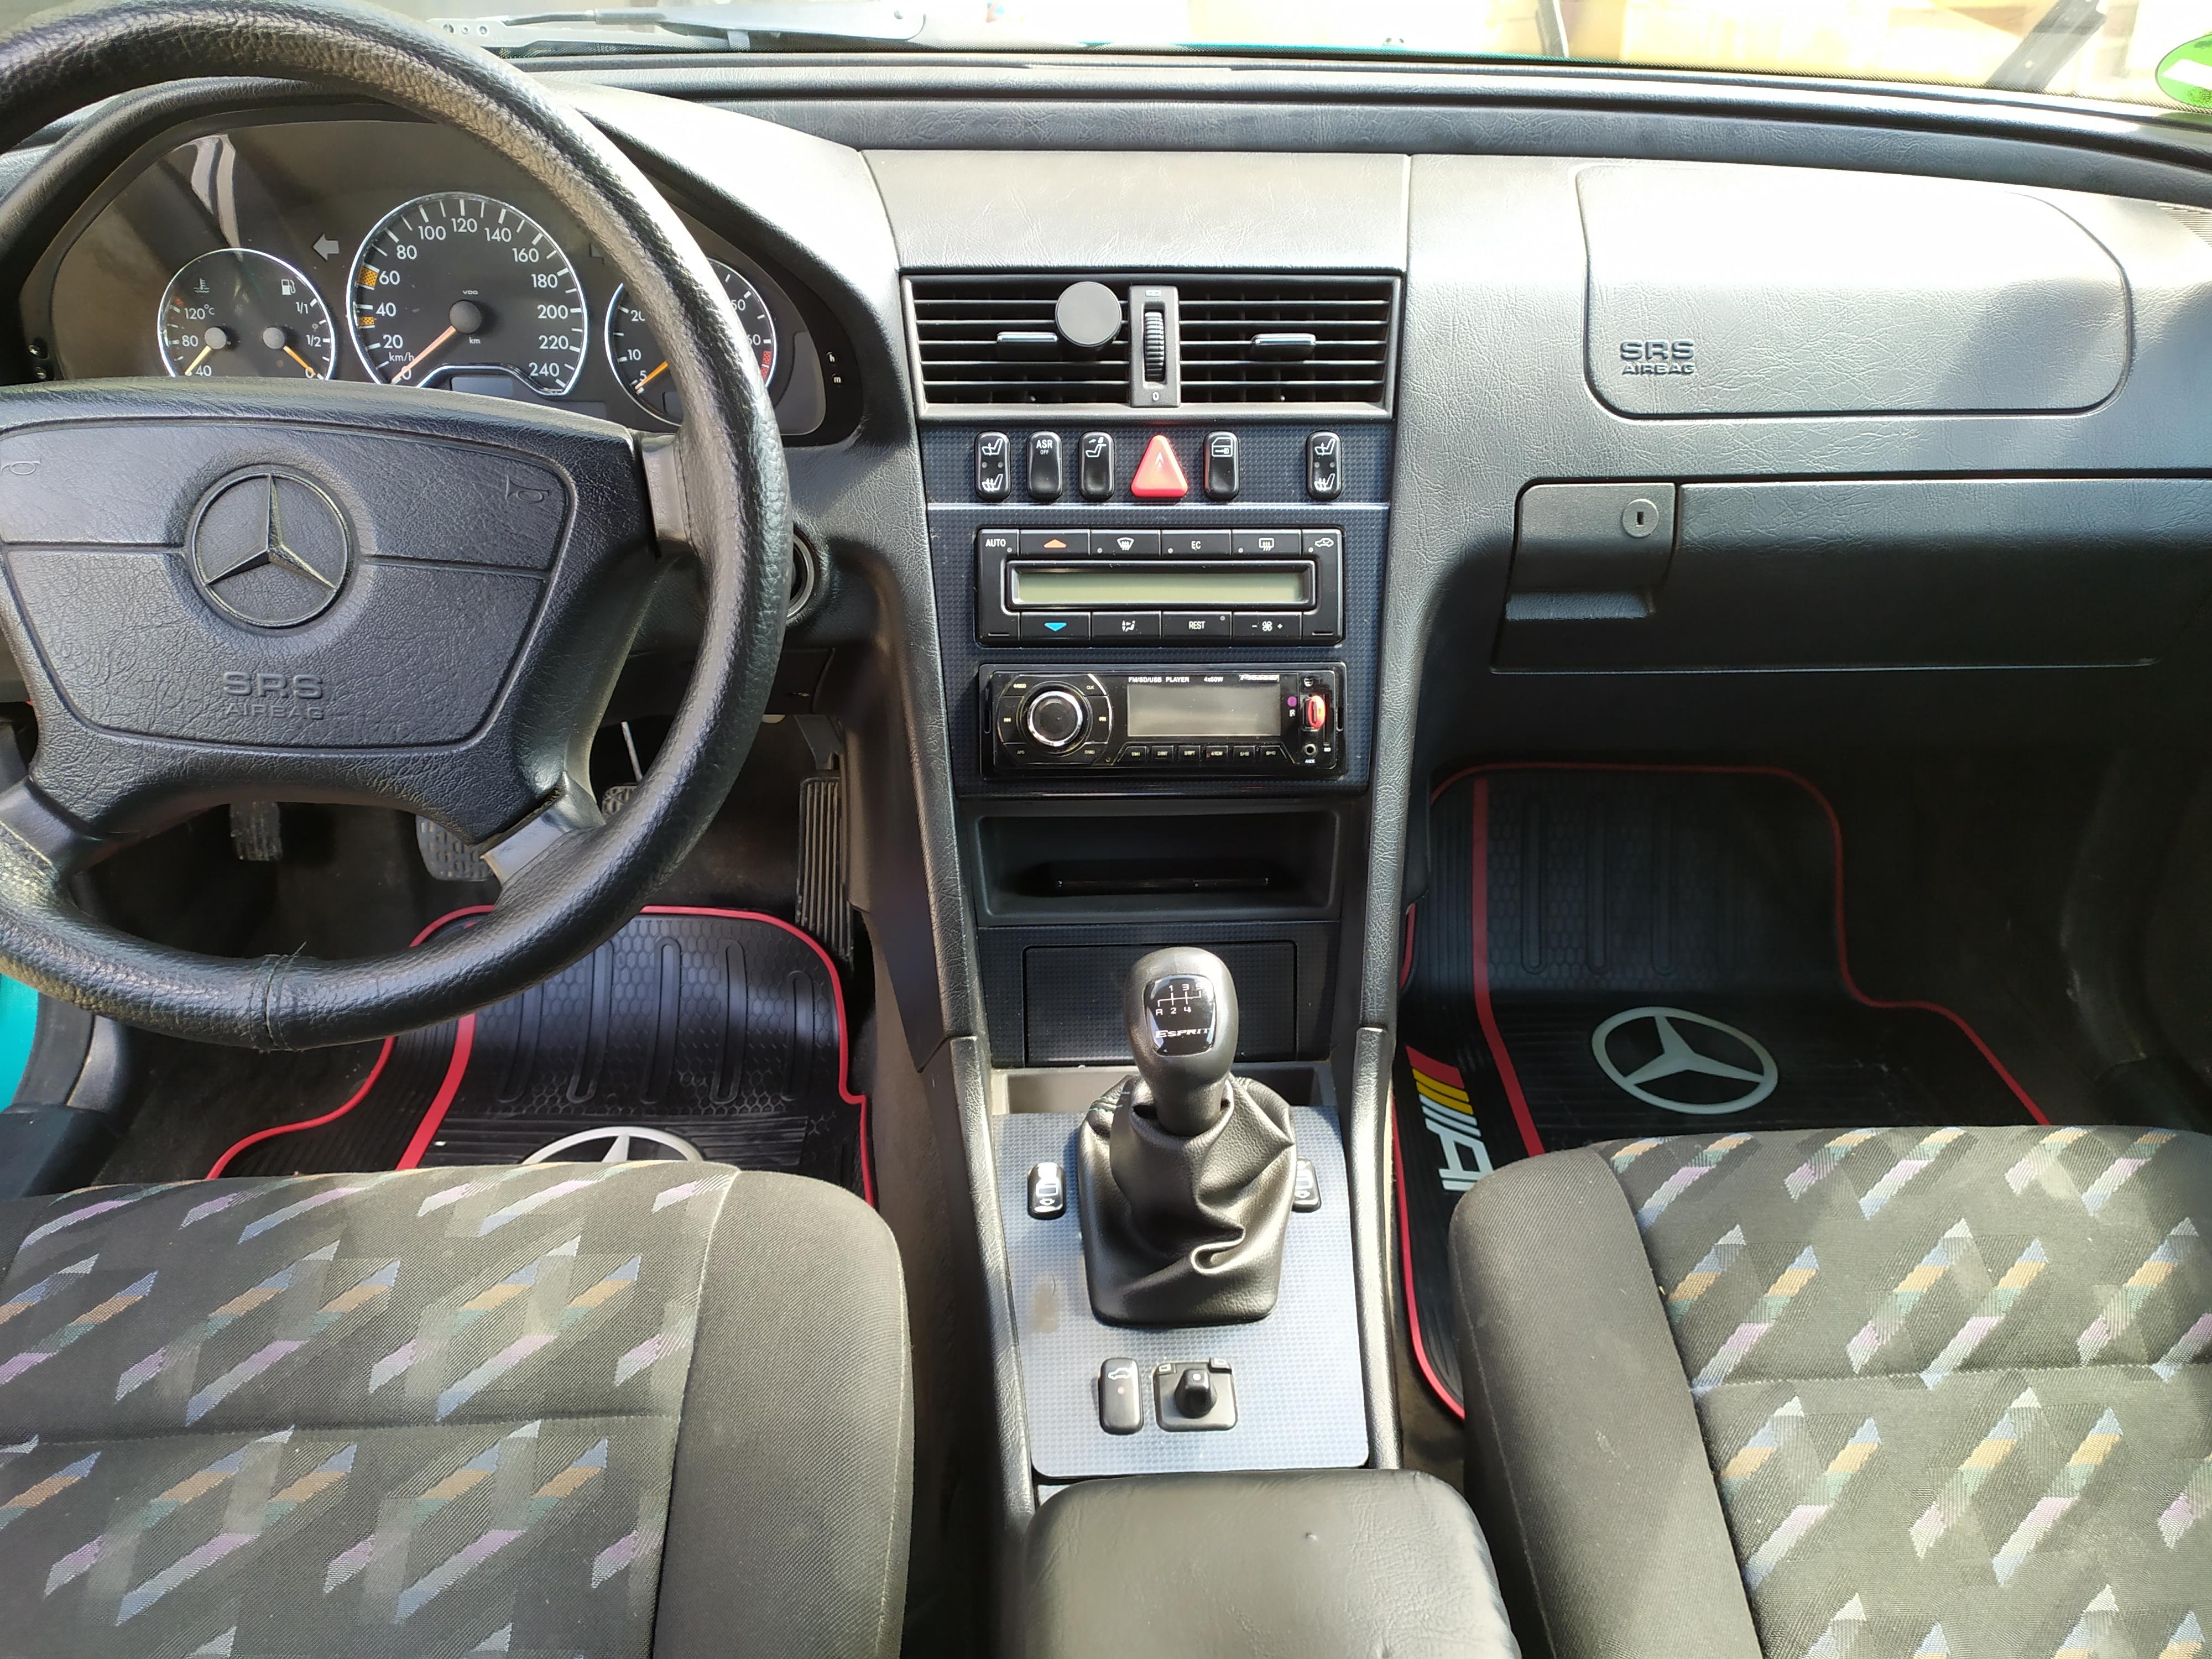 Mercedes-Benz C 200 2.0(lt) 1997 Second hand  $5800